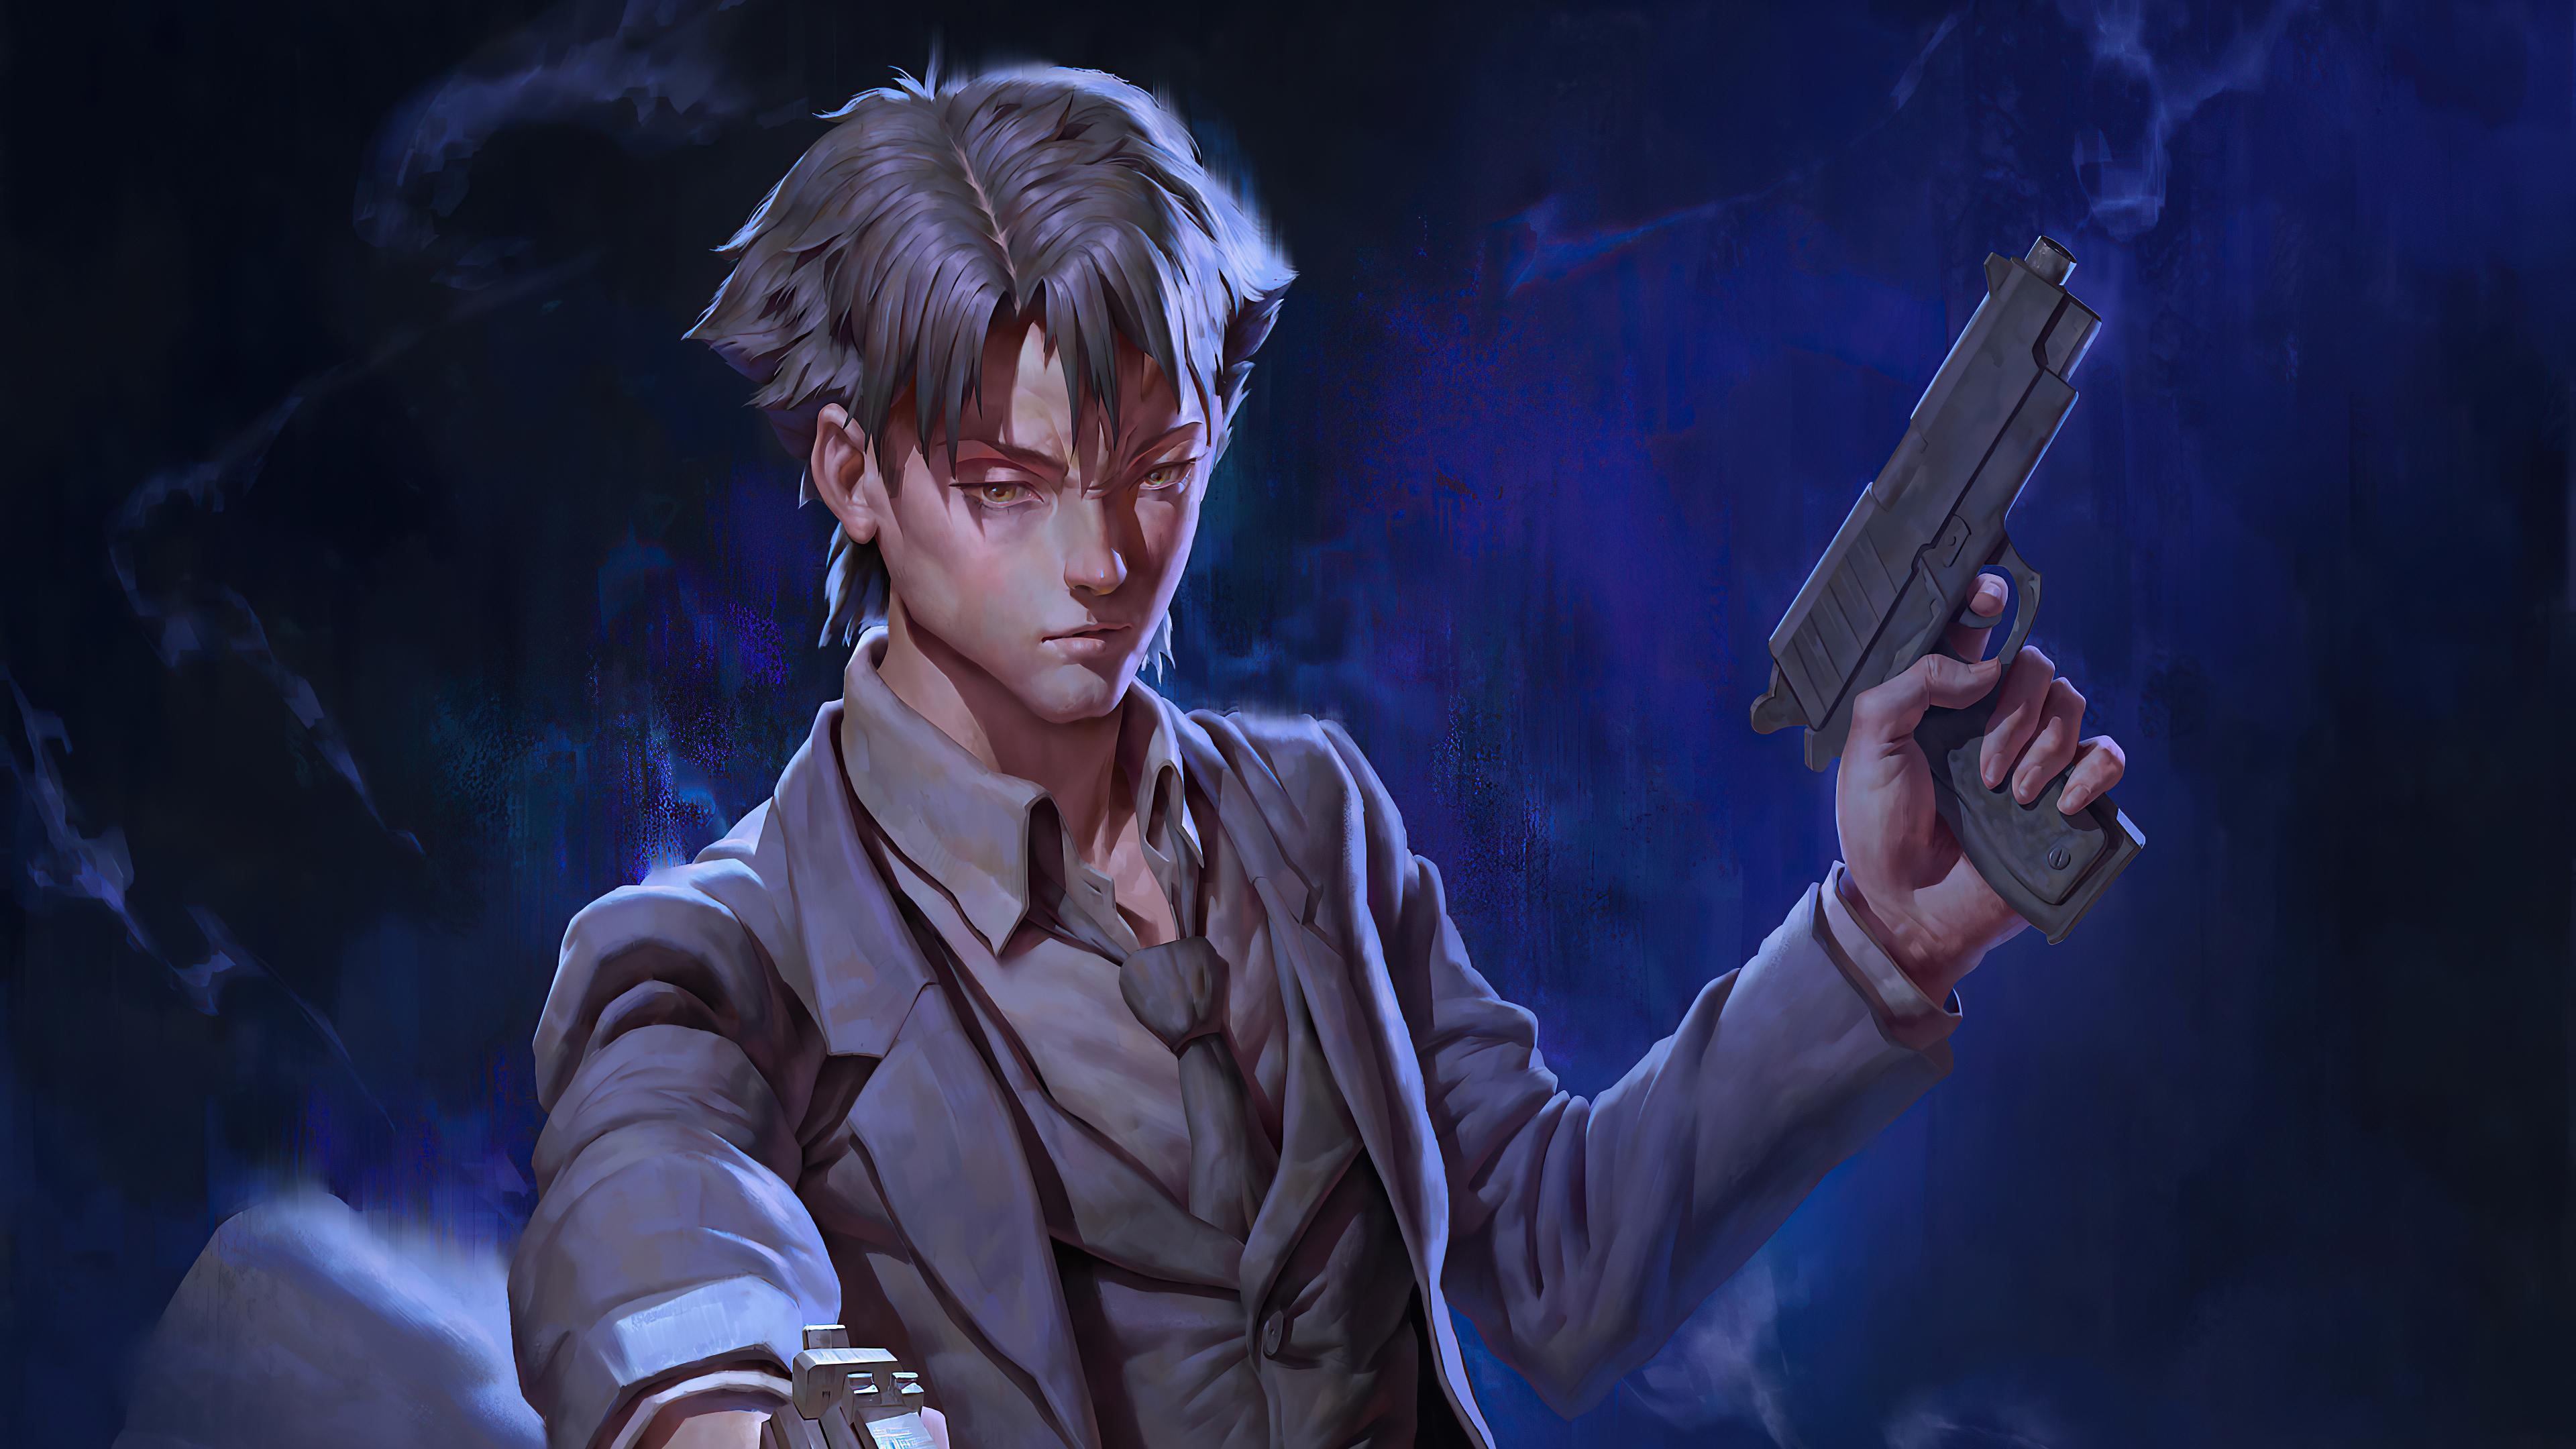 kiritsugu from fate zero 4k 1602436723 - Kiritsugu From Fate Zero 4k - Kiritsugu From Fate Zero 4k wallpapers